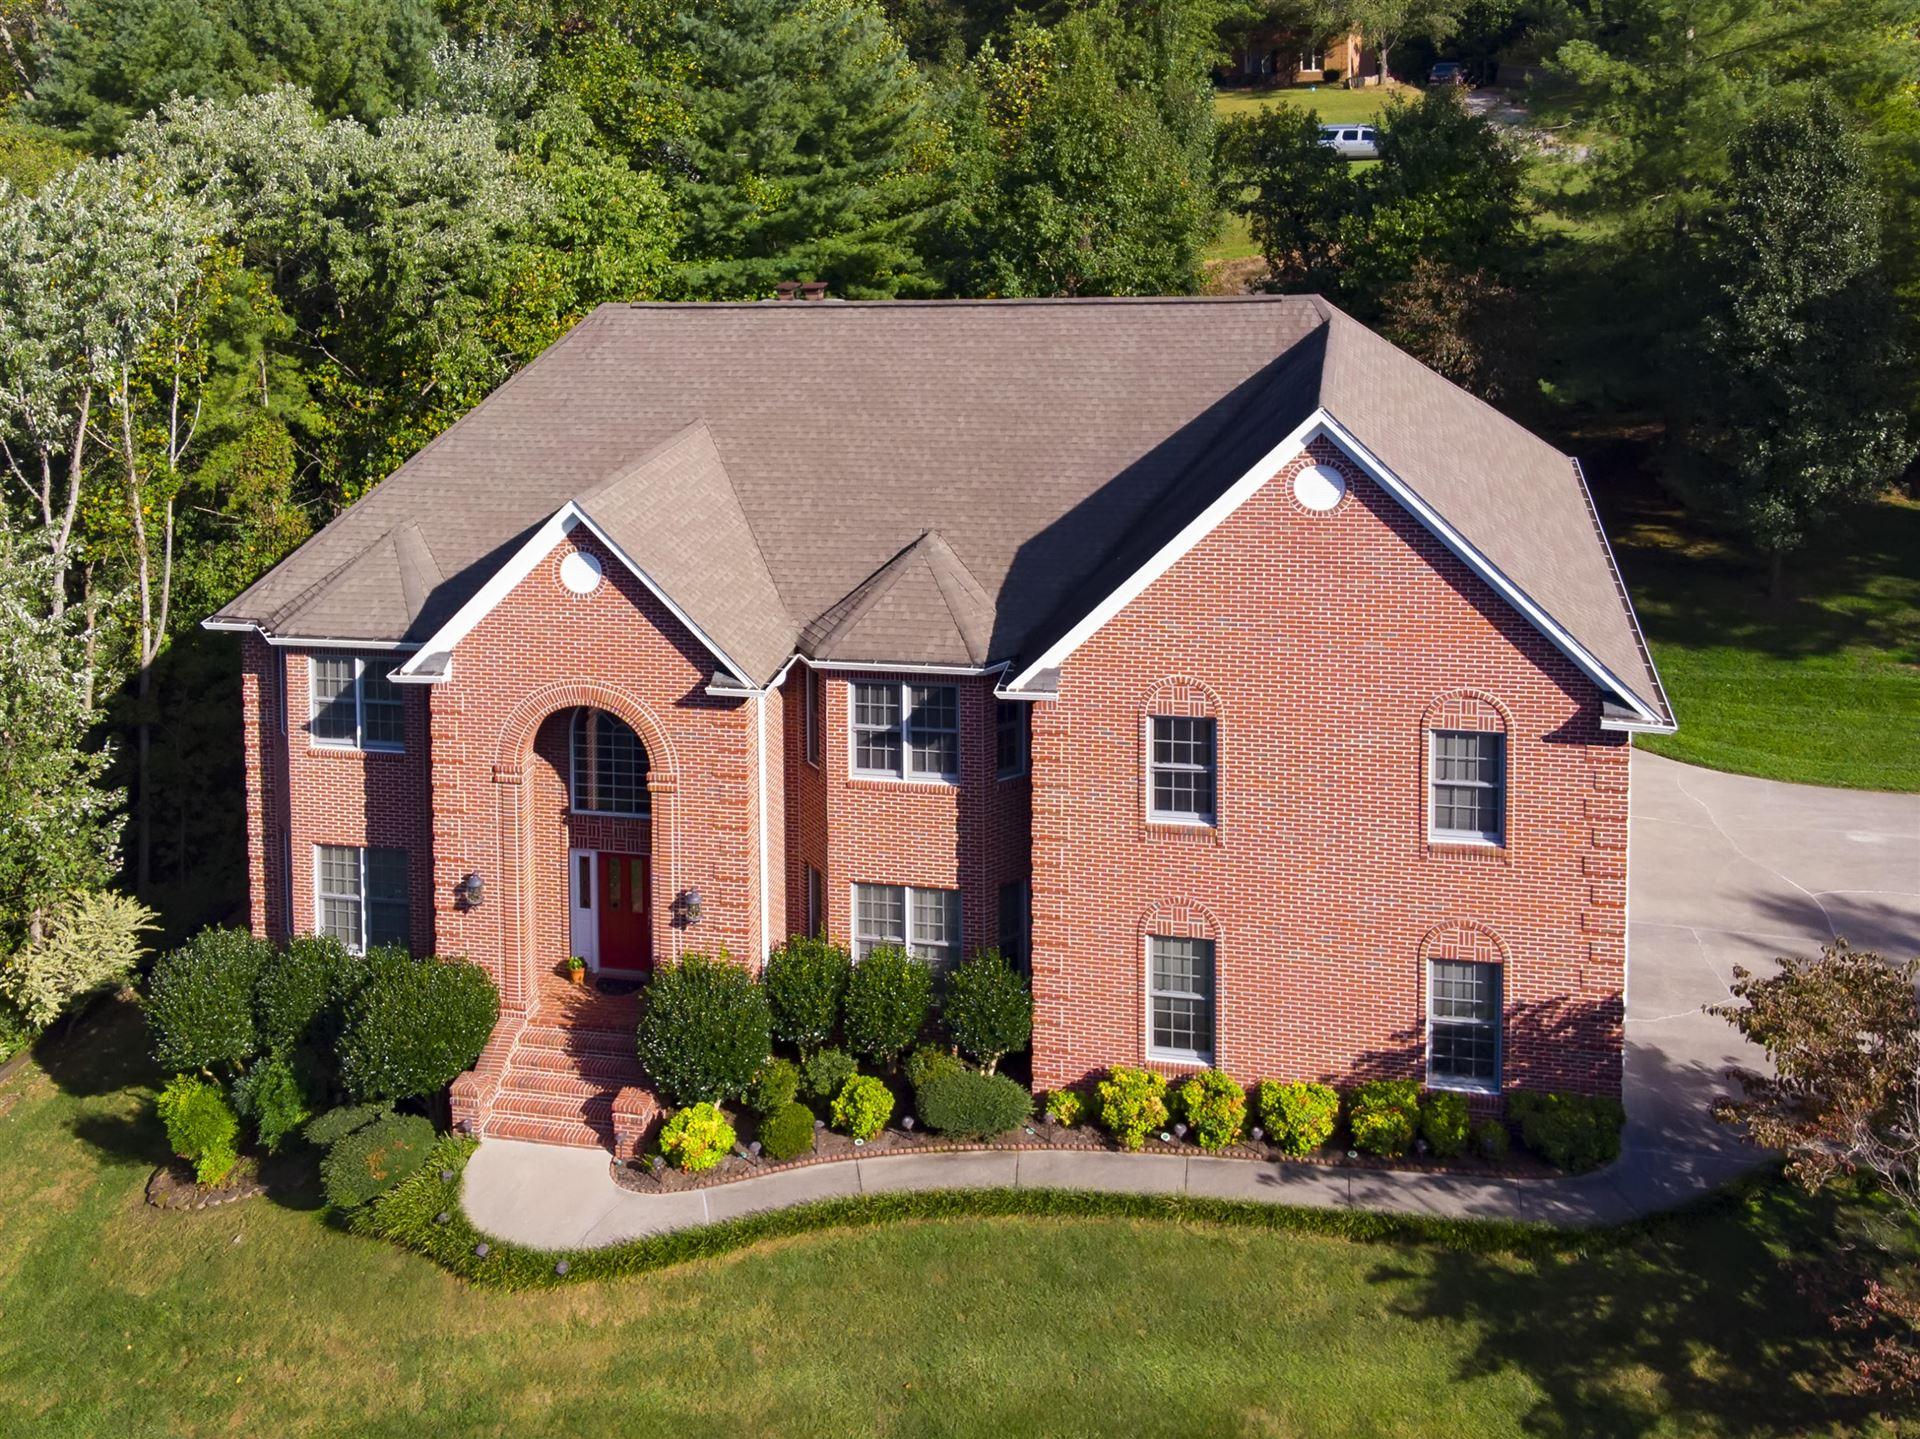 Photo of 115 Dansworth Lane, Oak Ridge, TN 37830 (MLS # 1131636)